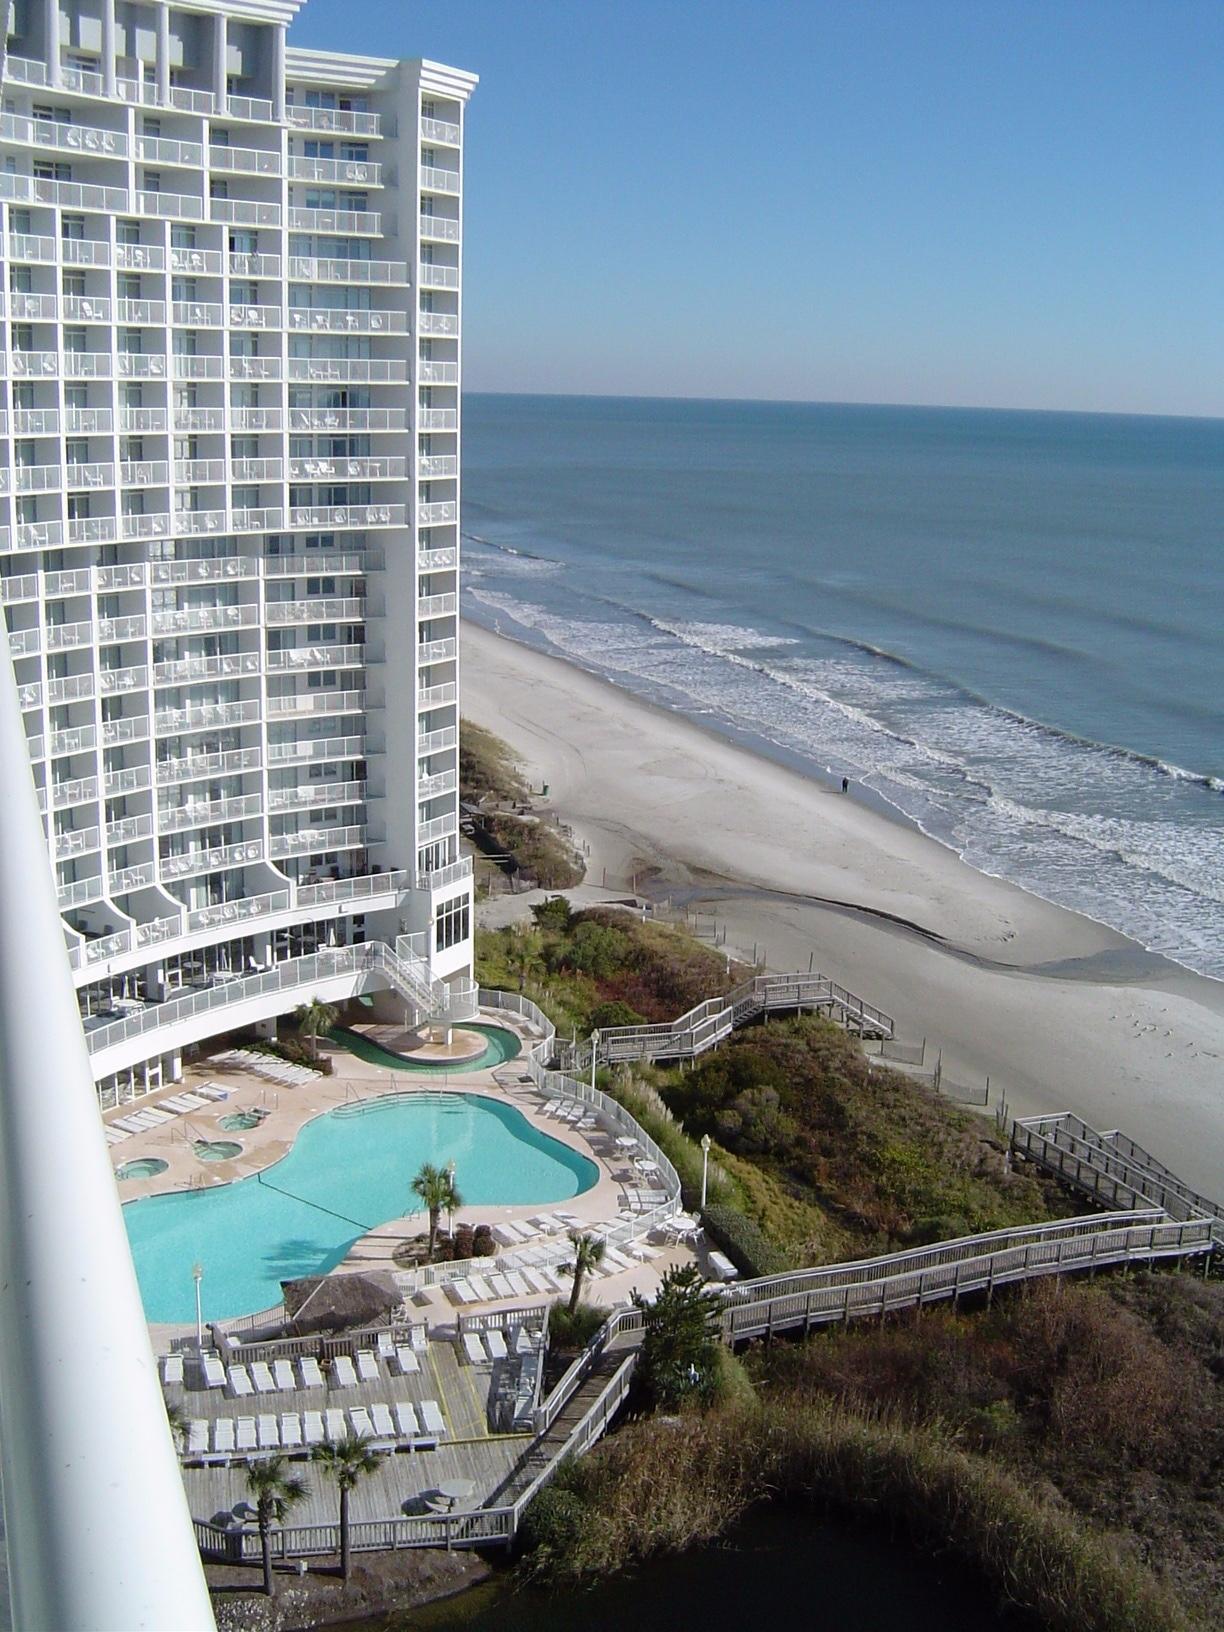 Apartment Seawatch Plantation 2 Bedrooms 2 Bathrooms photo 20365228